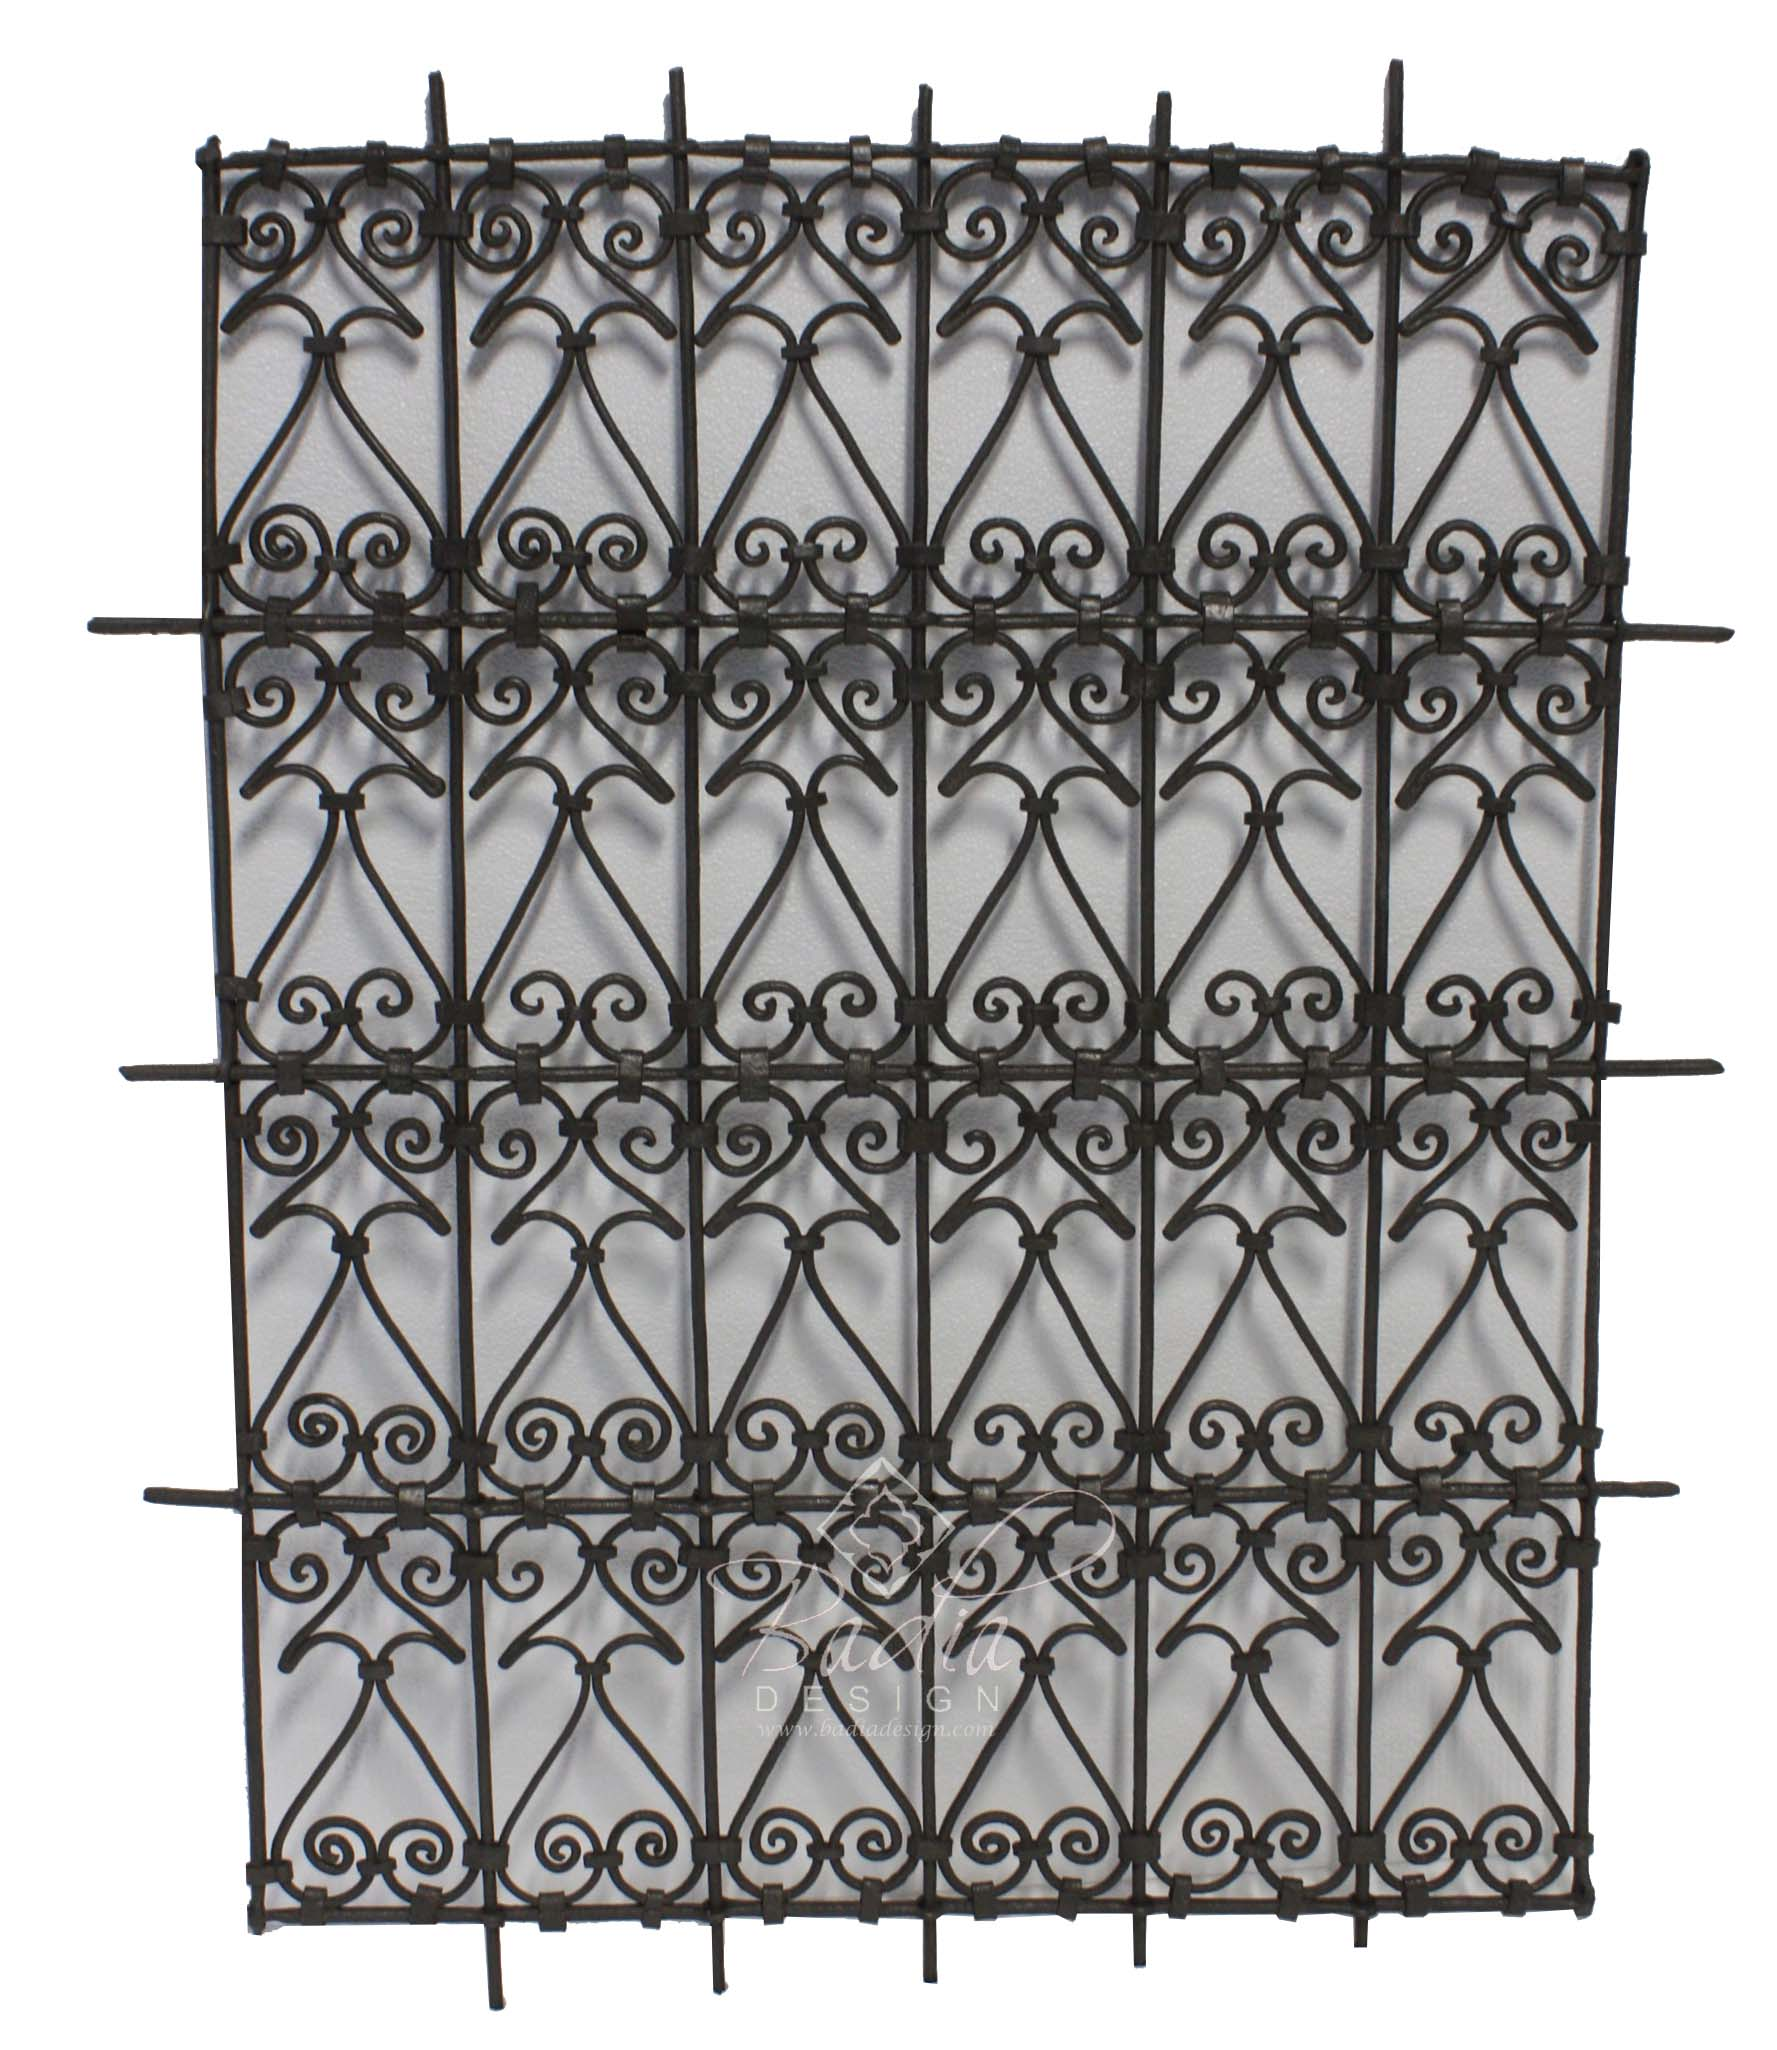 moroccan-rectangular-shaped-wrought-iron-panel-ip021.jpg